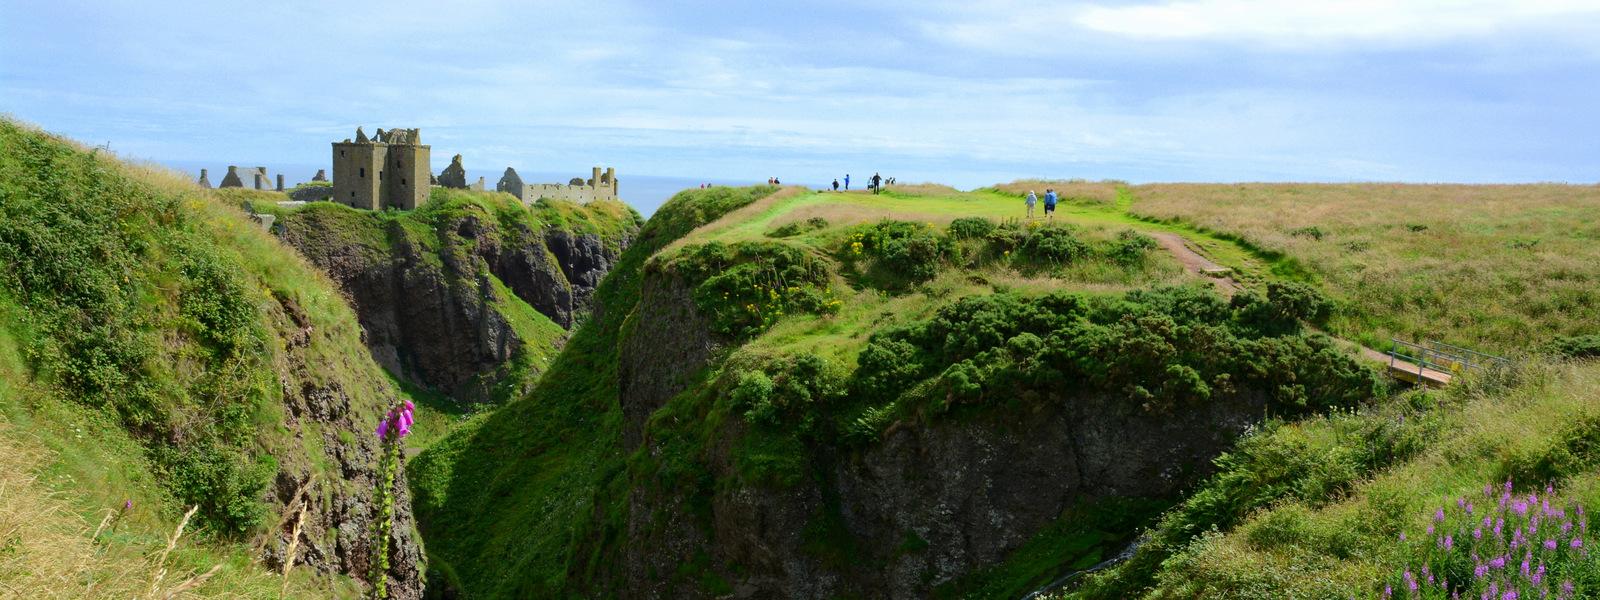 Dunnotar in Balmoral – idyllic Scottish castles